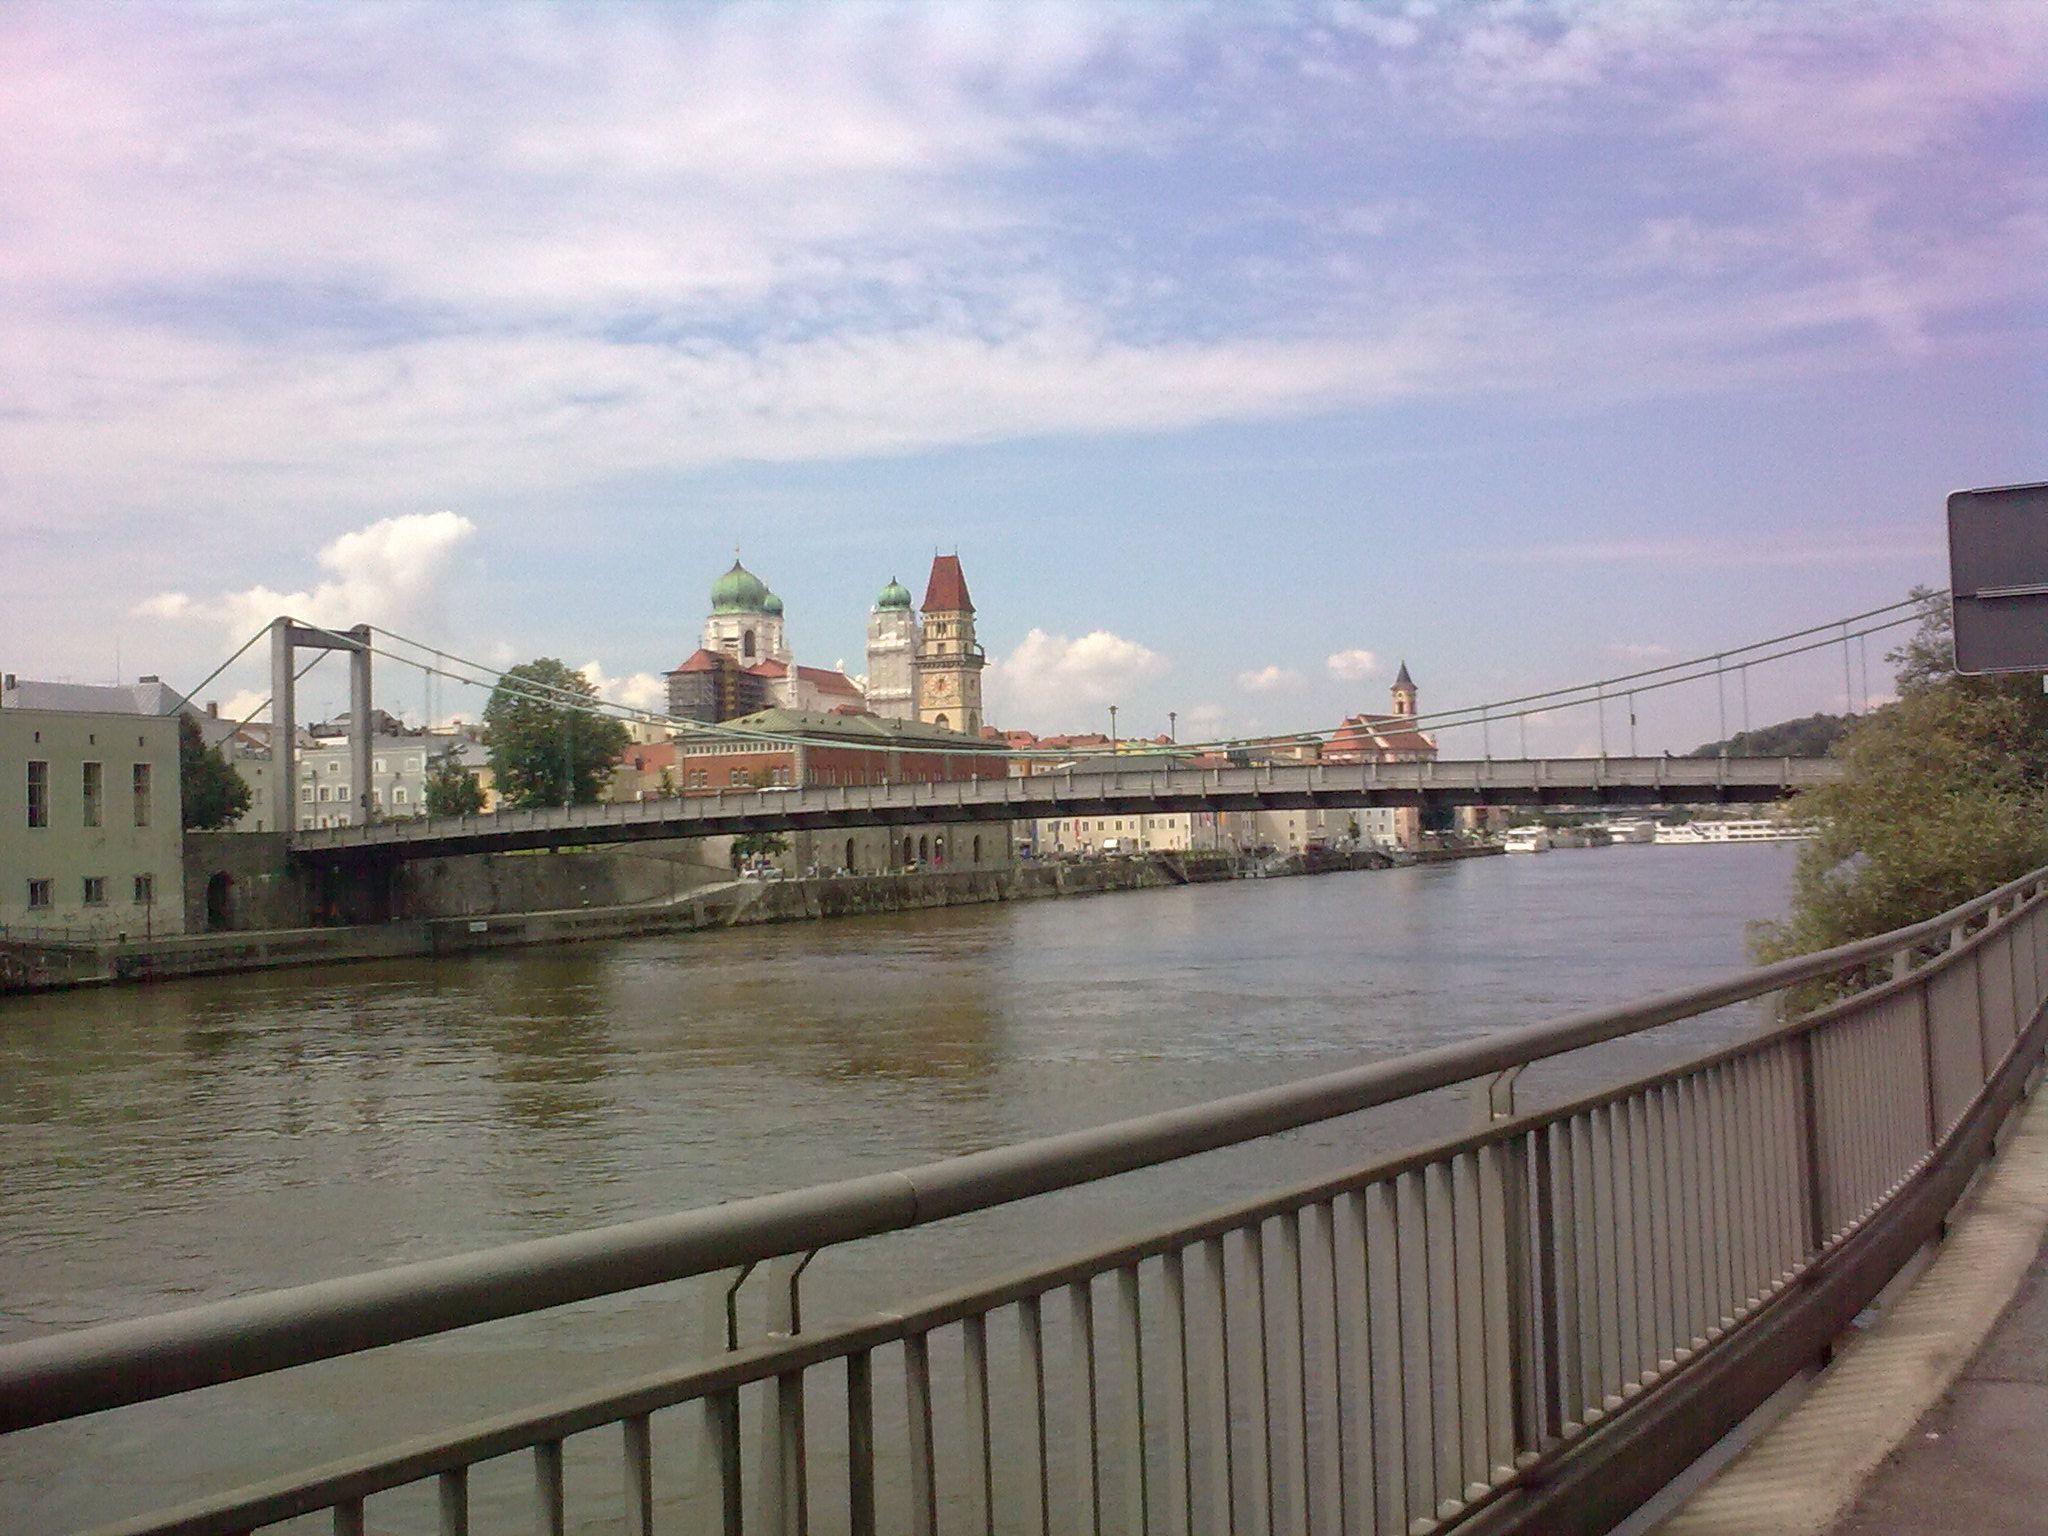 Luitpoldbrücke (Hängebrücke)